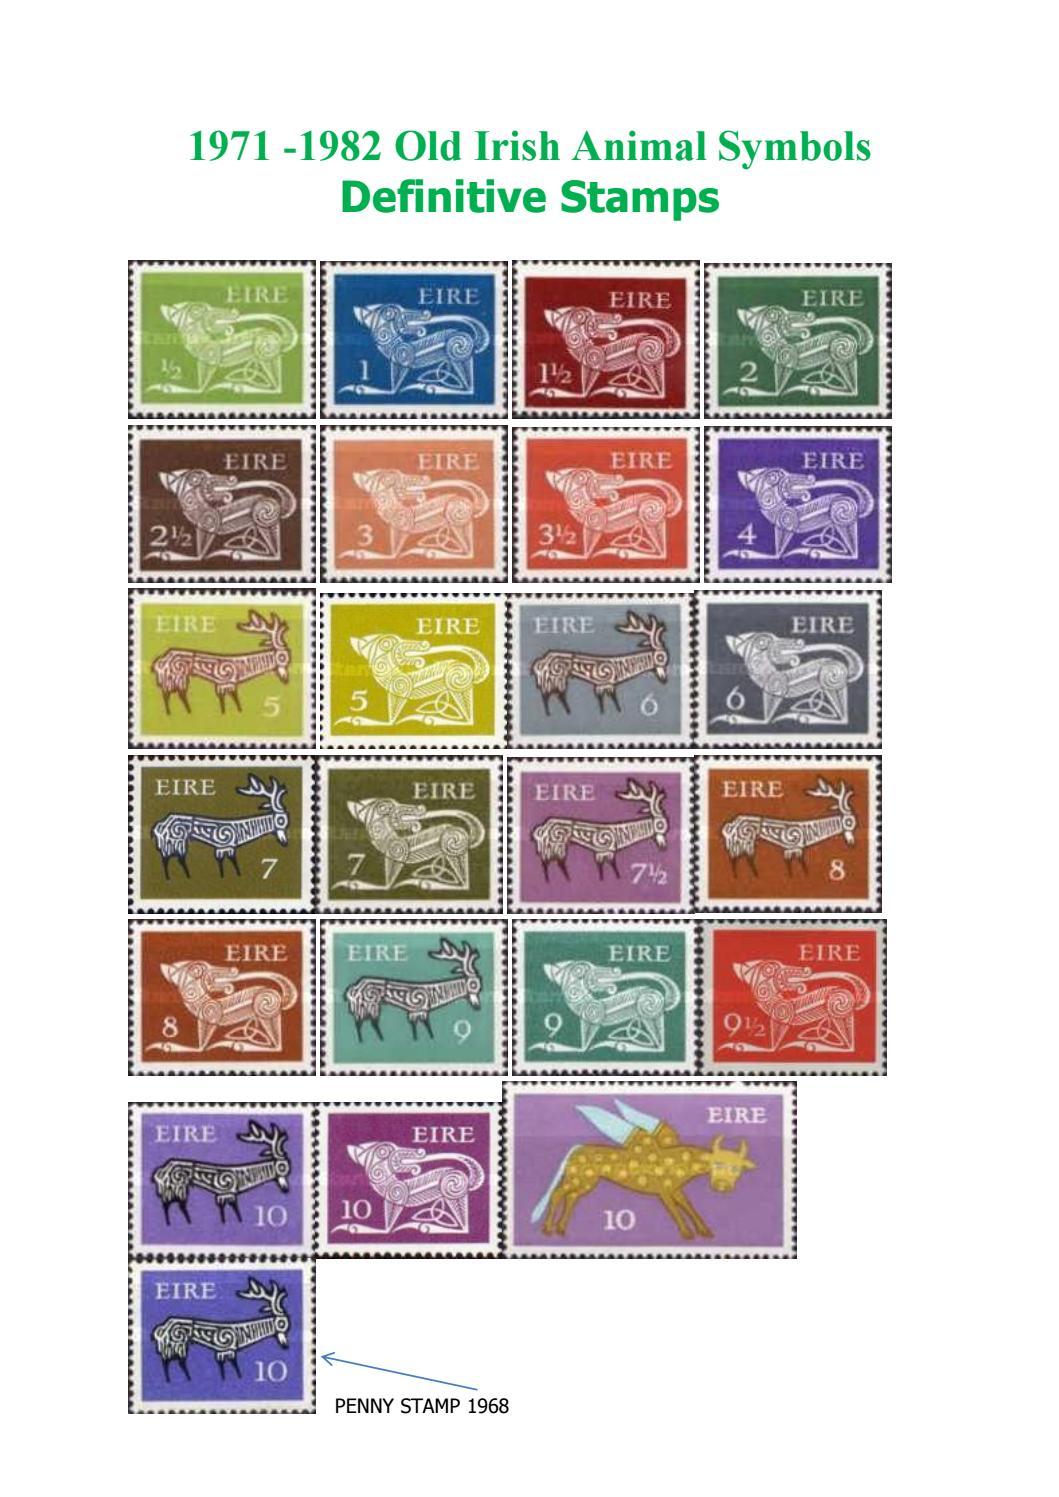 1968 1982 Old Irish Animal Stamps By Joseph Robinson Issuu